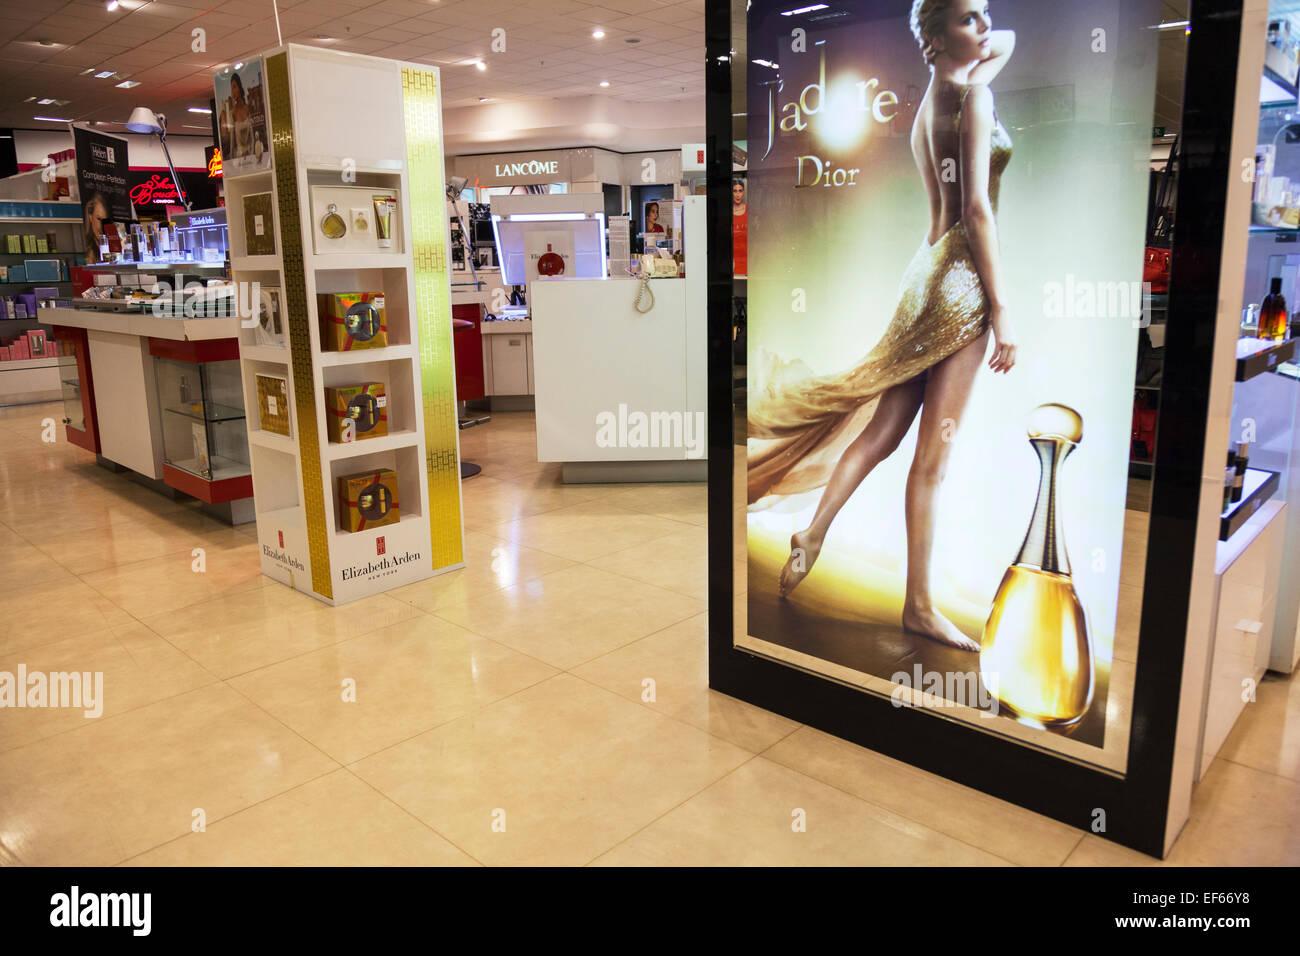 House of Fraser perfume and makeup department Dior Lancome Elizabeth Arden J'adore UK England  shop store inside - Stock Image